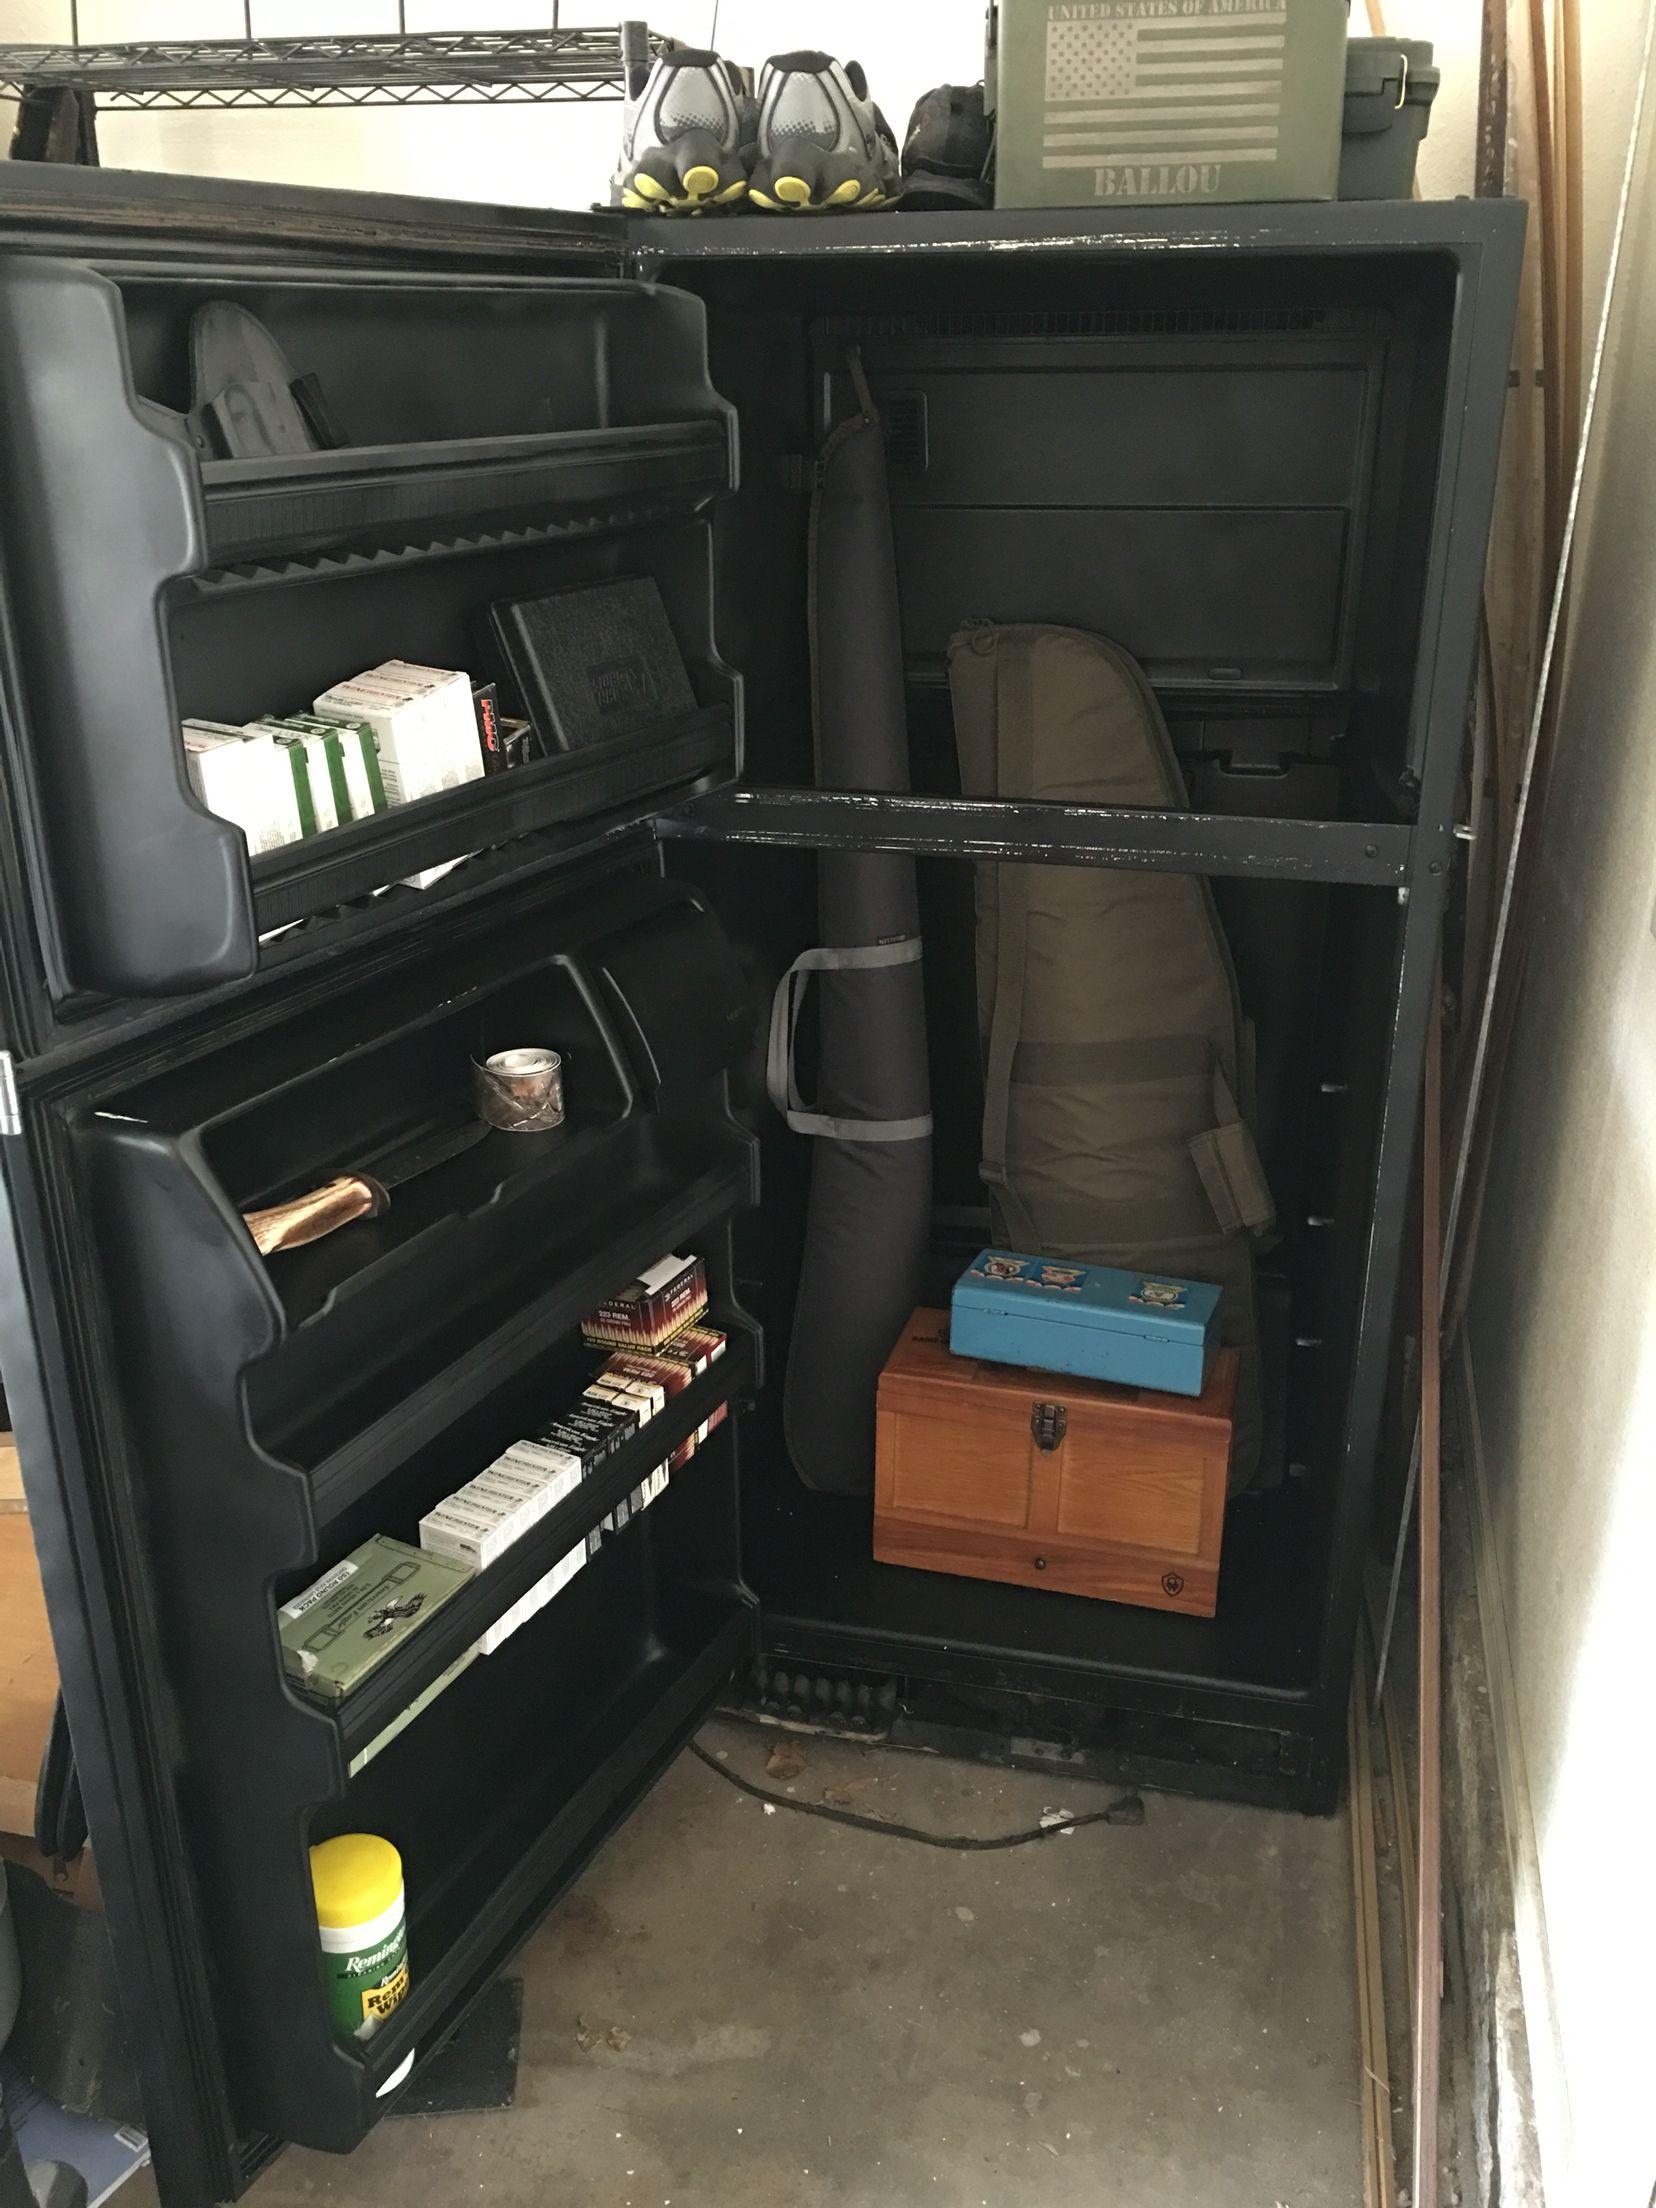 Gun Safe I Upcycled From Old Refrigerator Mantastic